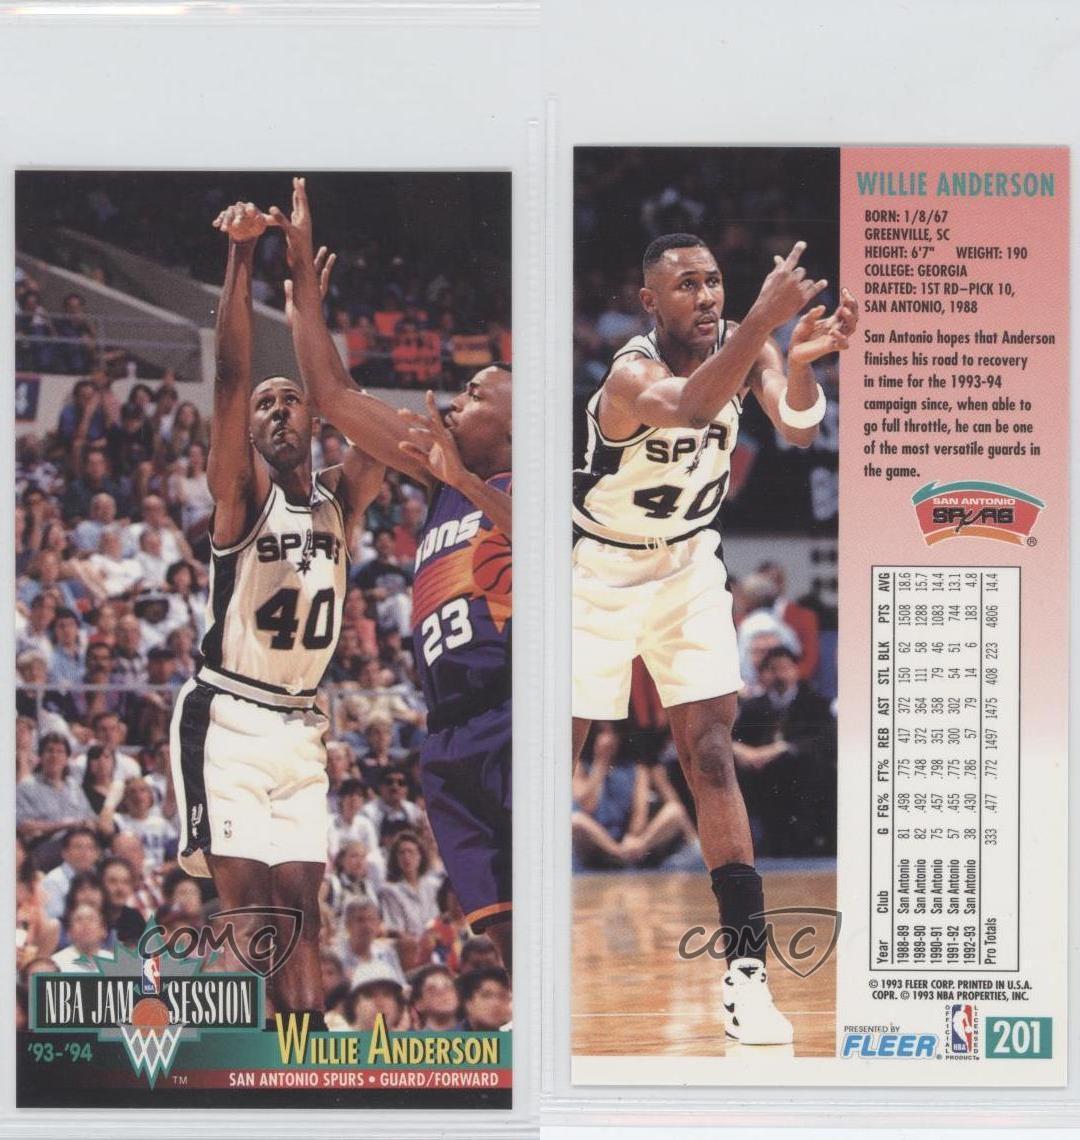 1993-94 NBA Jam Session #201 Willie Anderson San Antonio